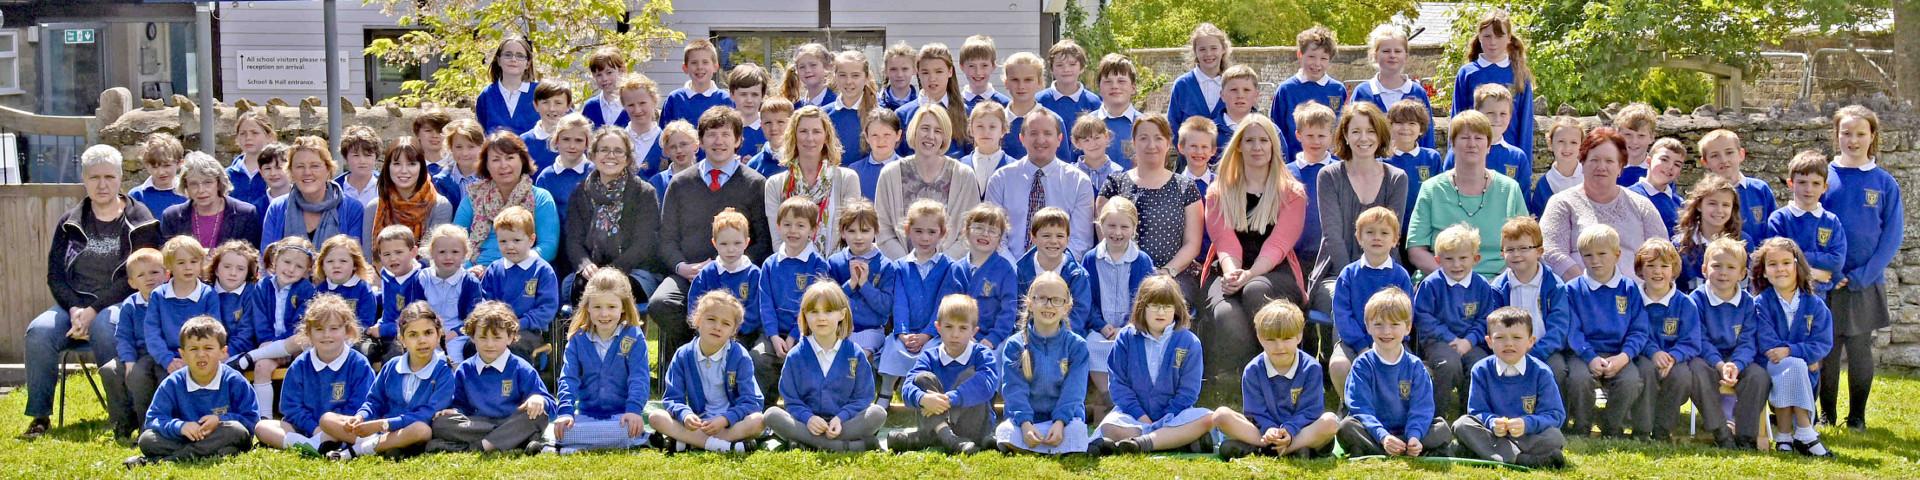 Whole School photograph – 2015